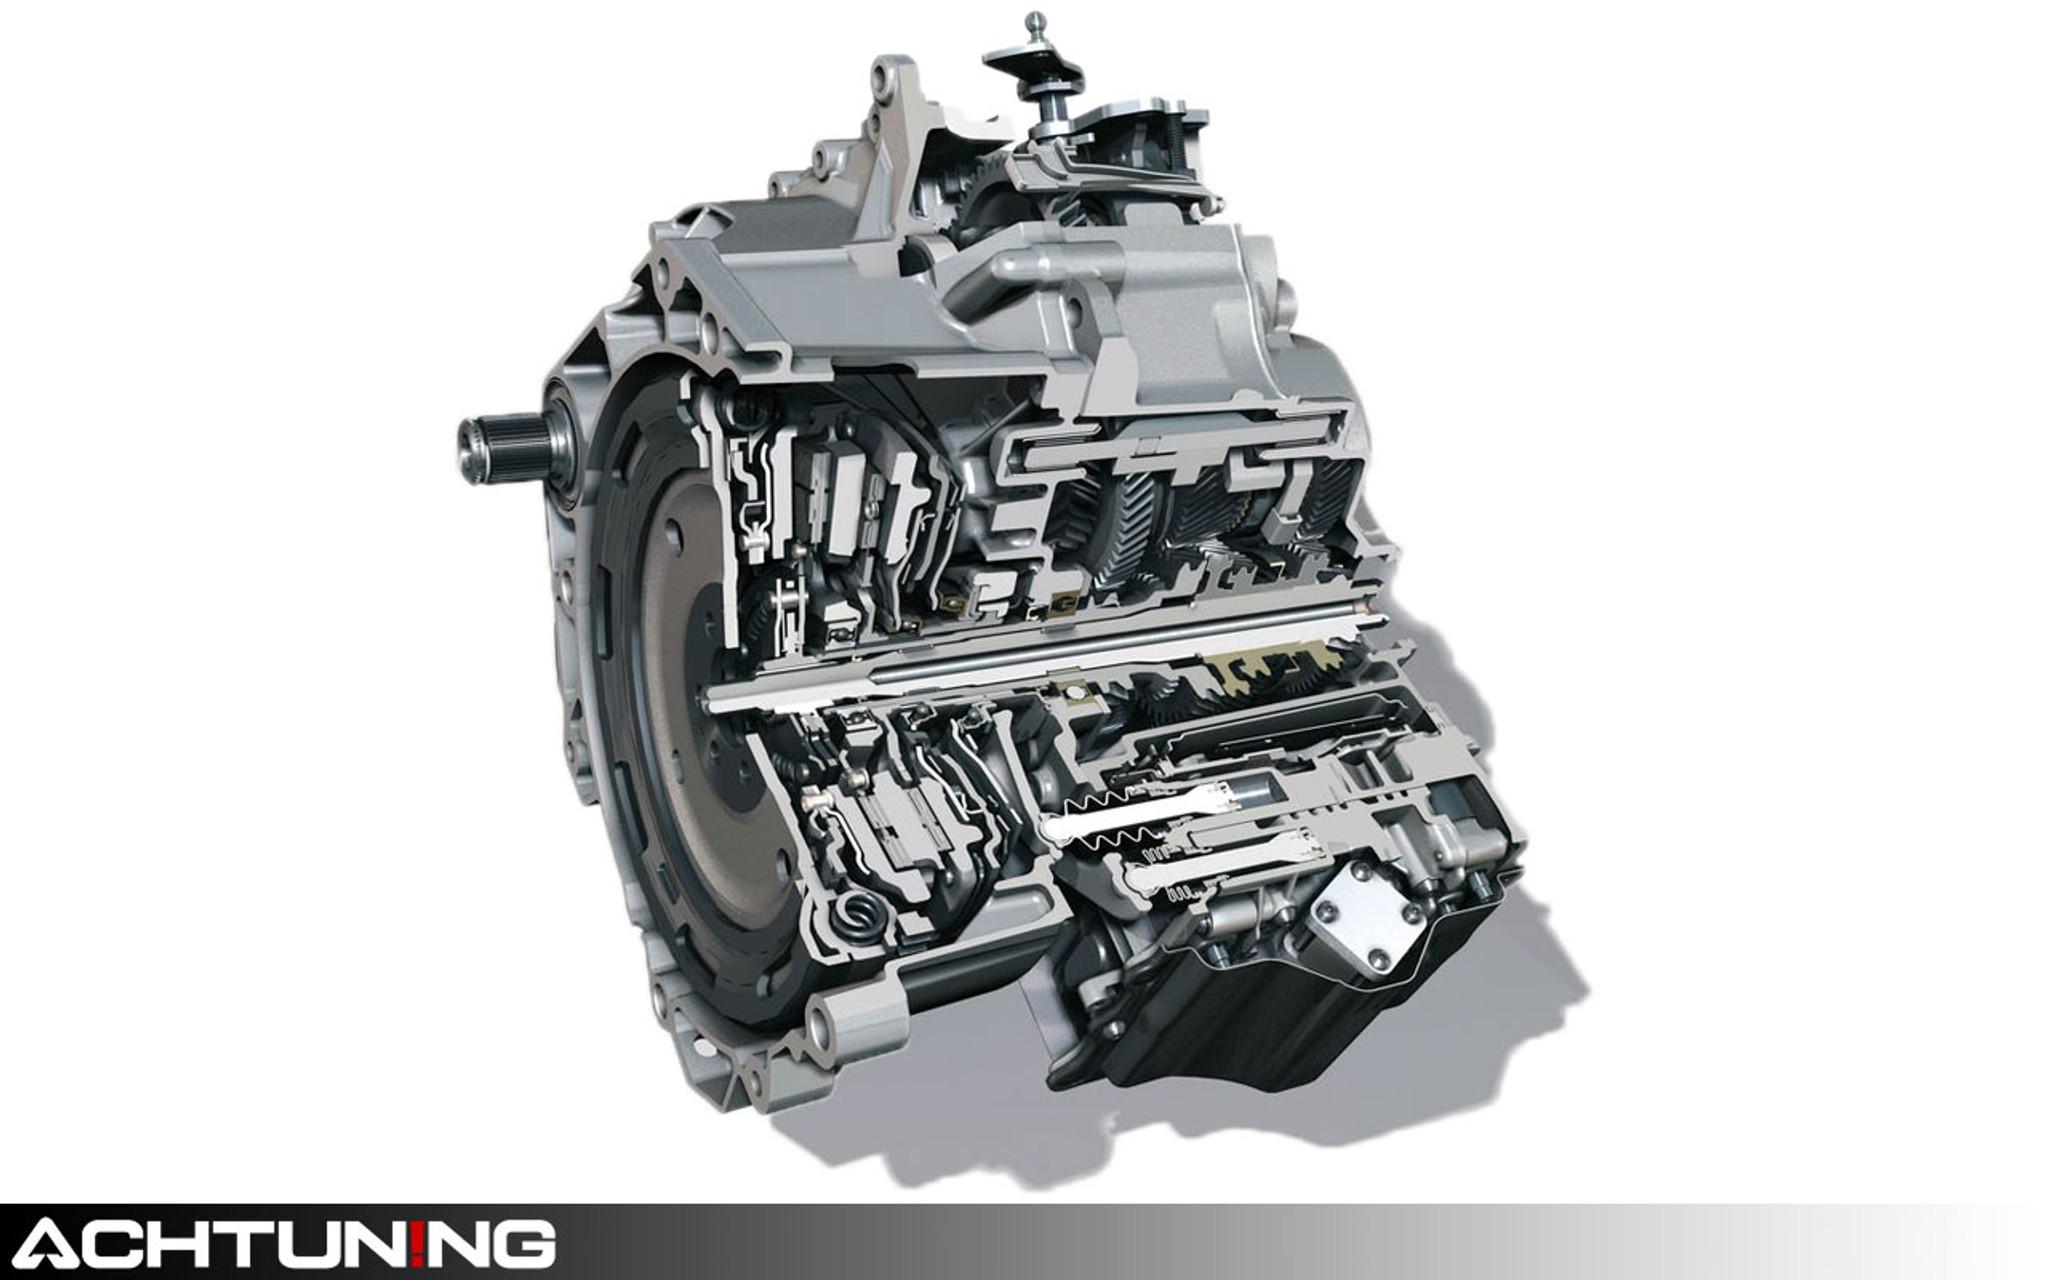 Tvs Tcu Software Flash Tuning Dq250 Gen 1 6 Speed Dsg Audi Vw Achtuning